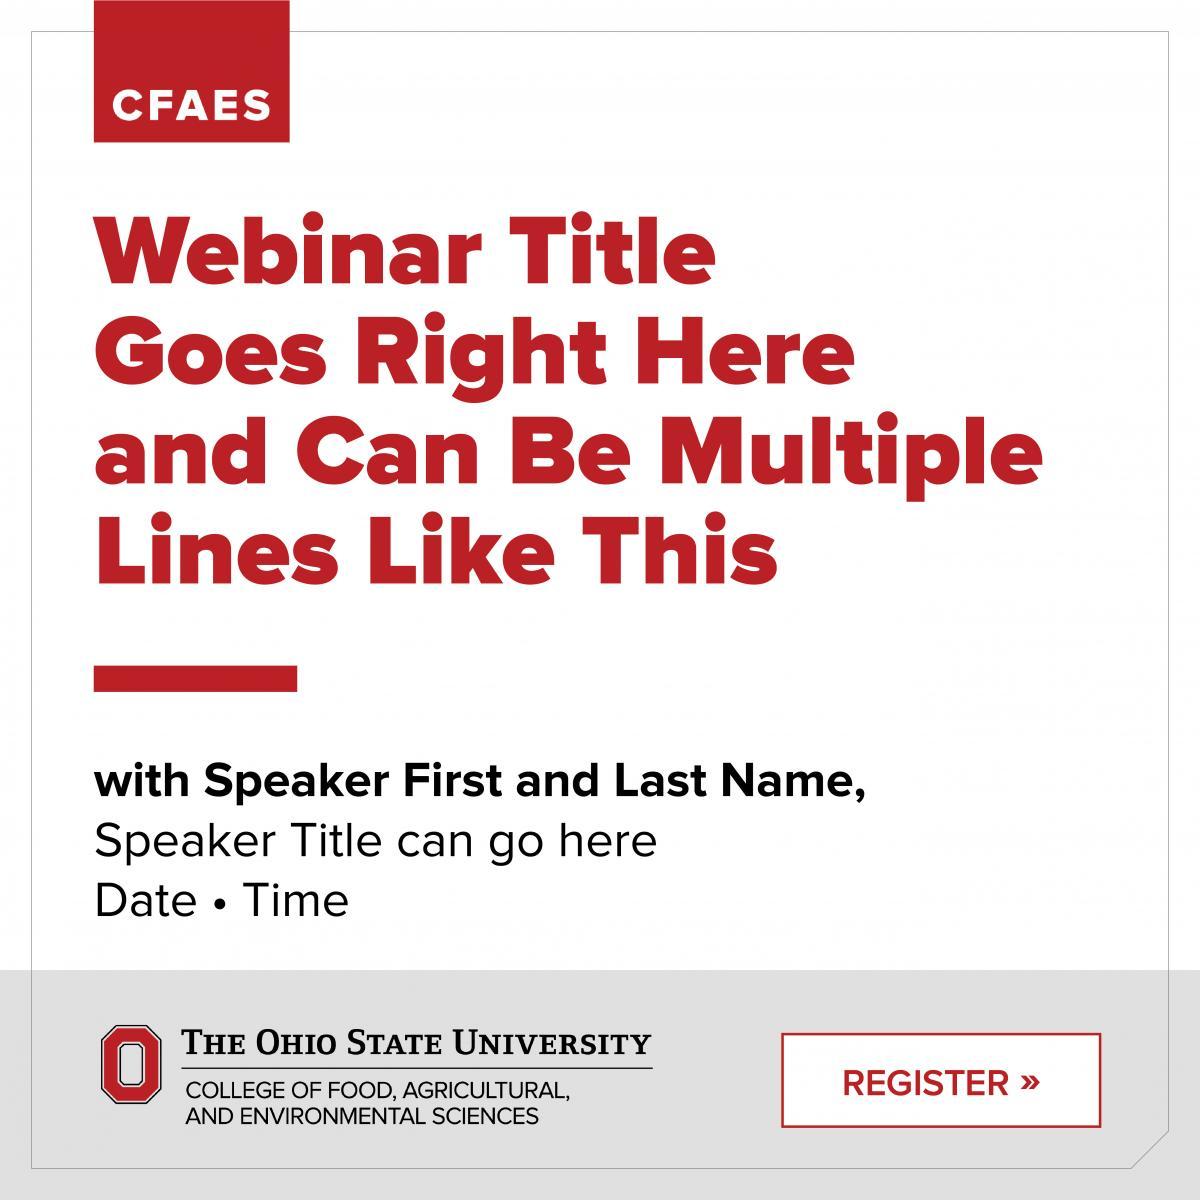 CFAES Webinar Graphic